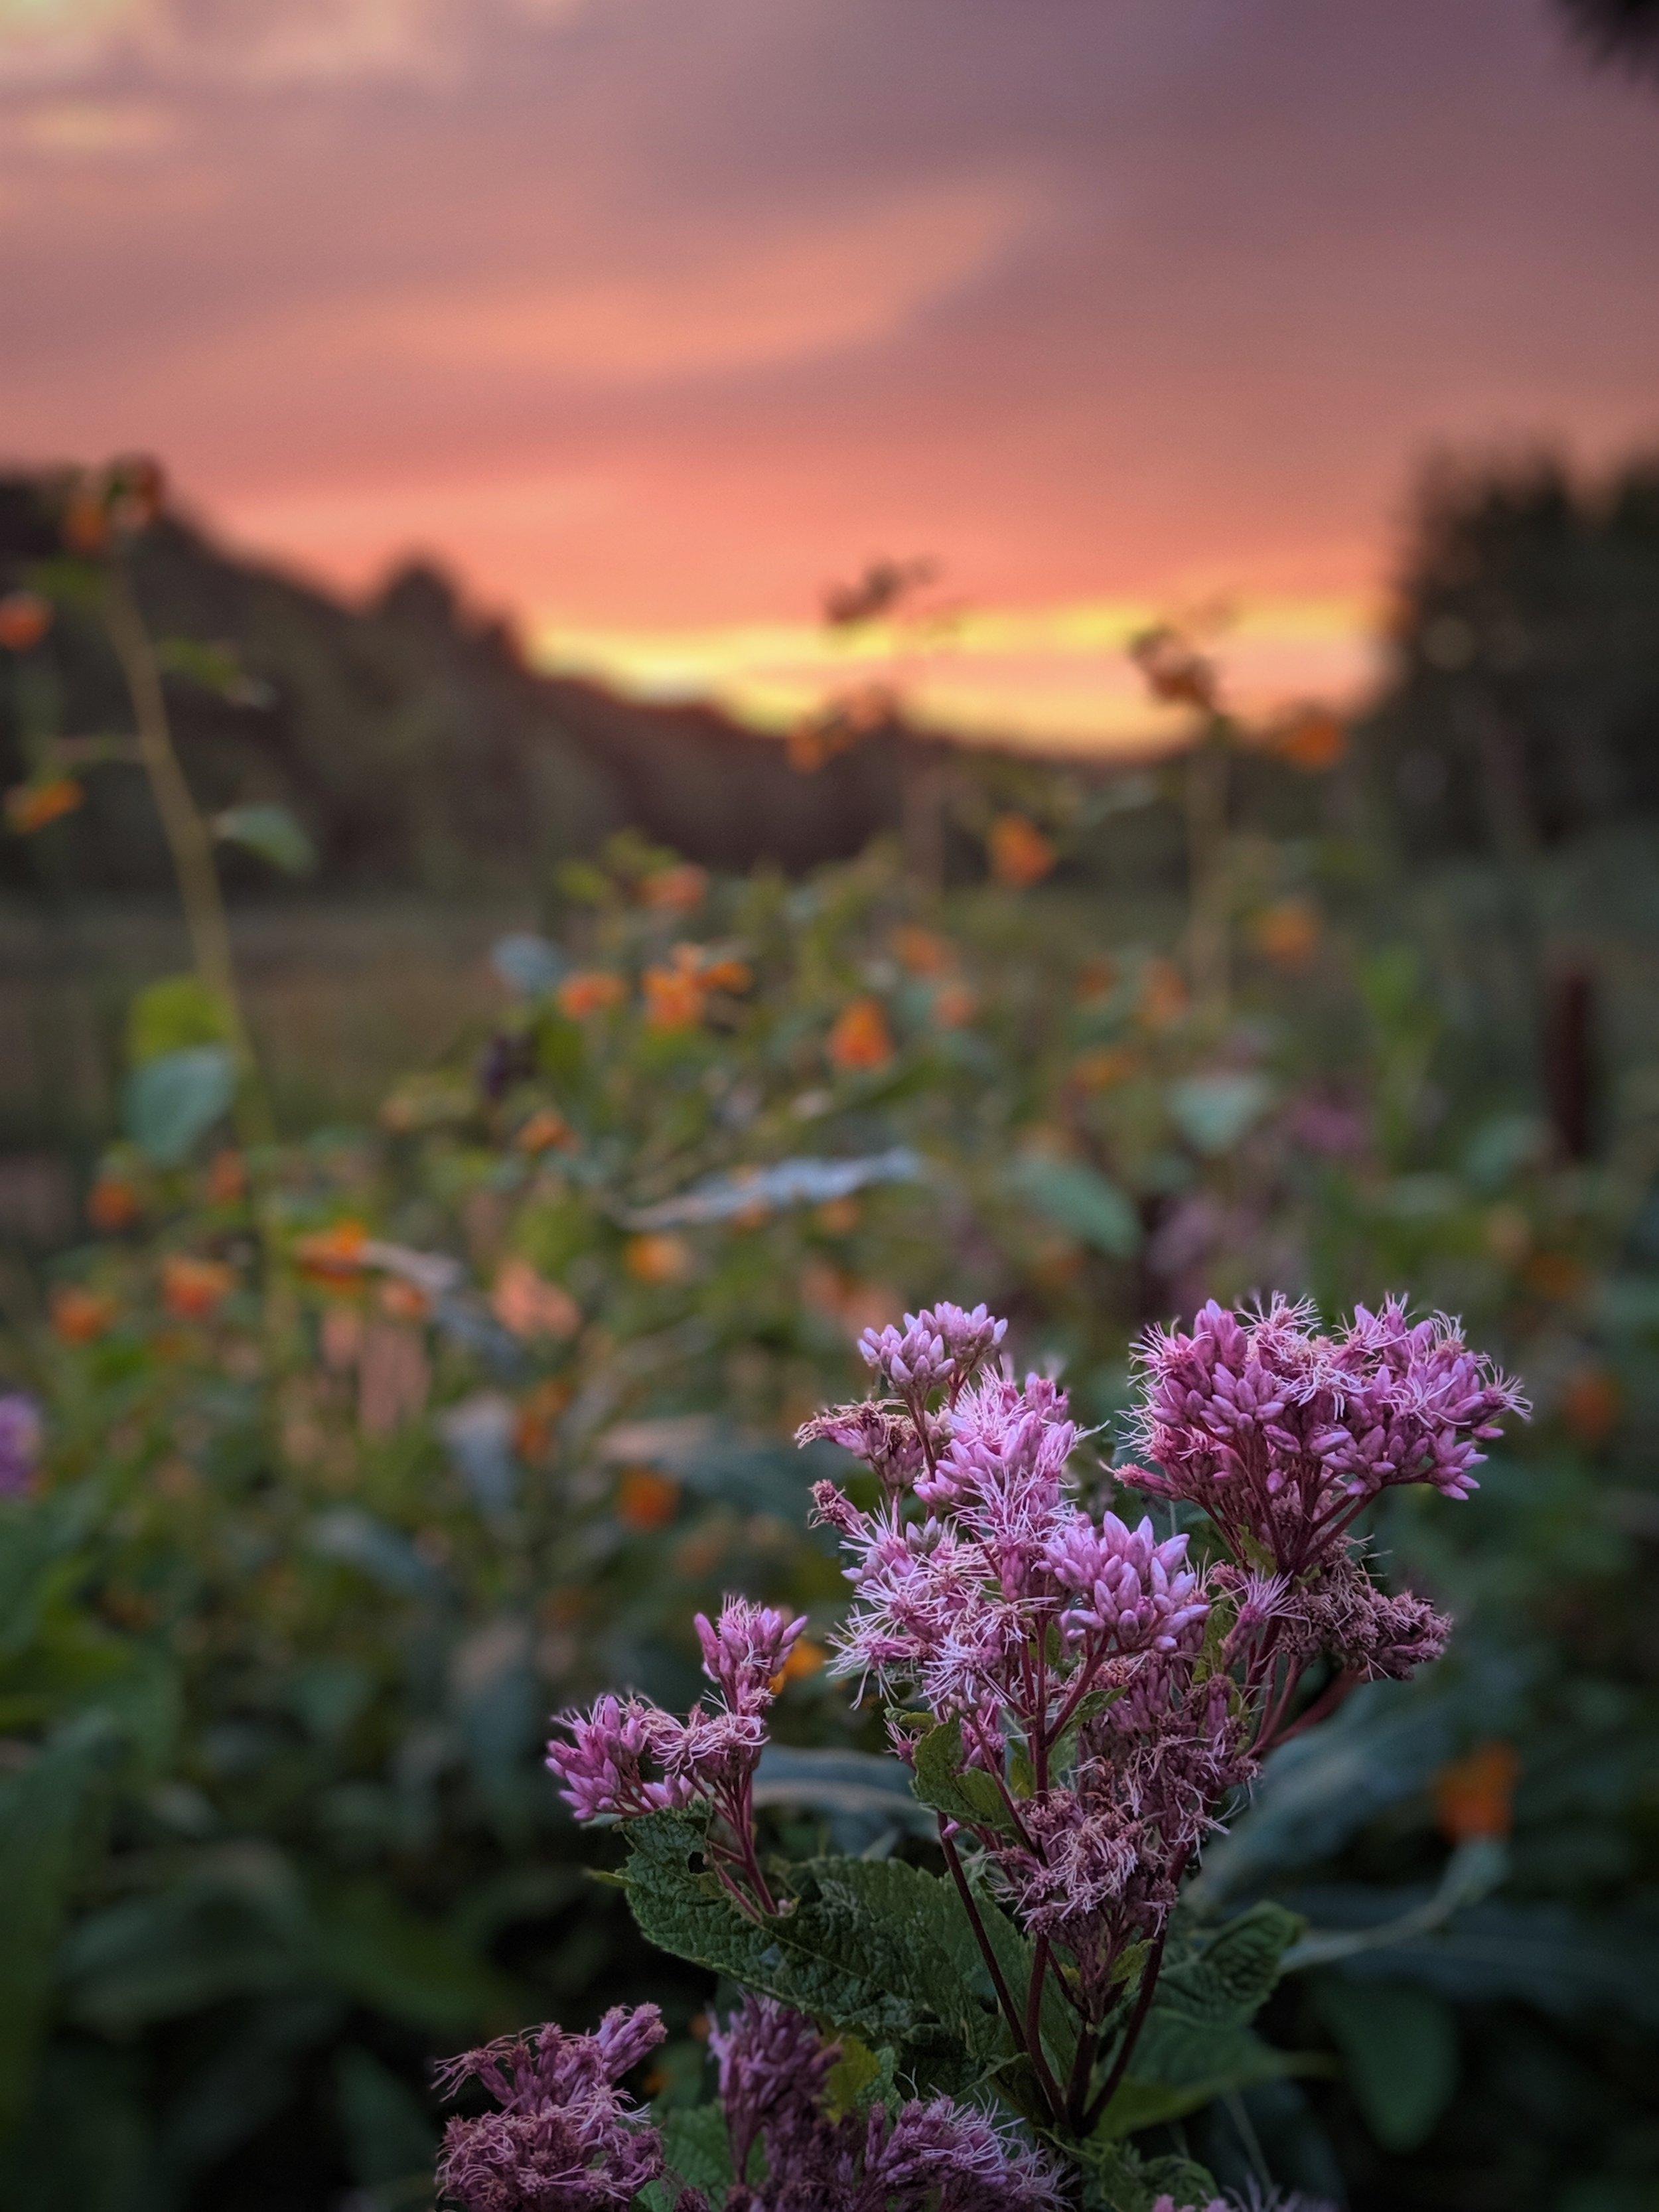 Easton Mountain at sunset. (Photo by Adam Nicholson)